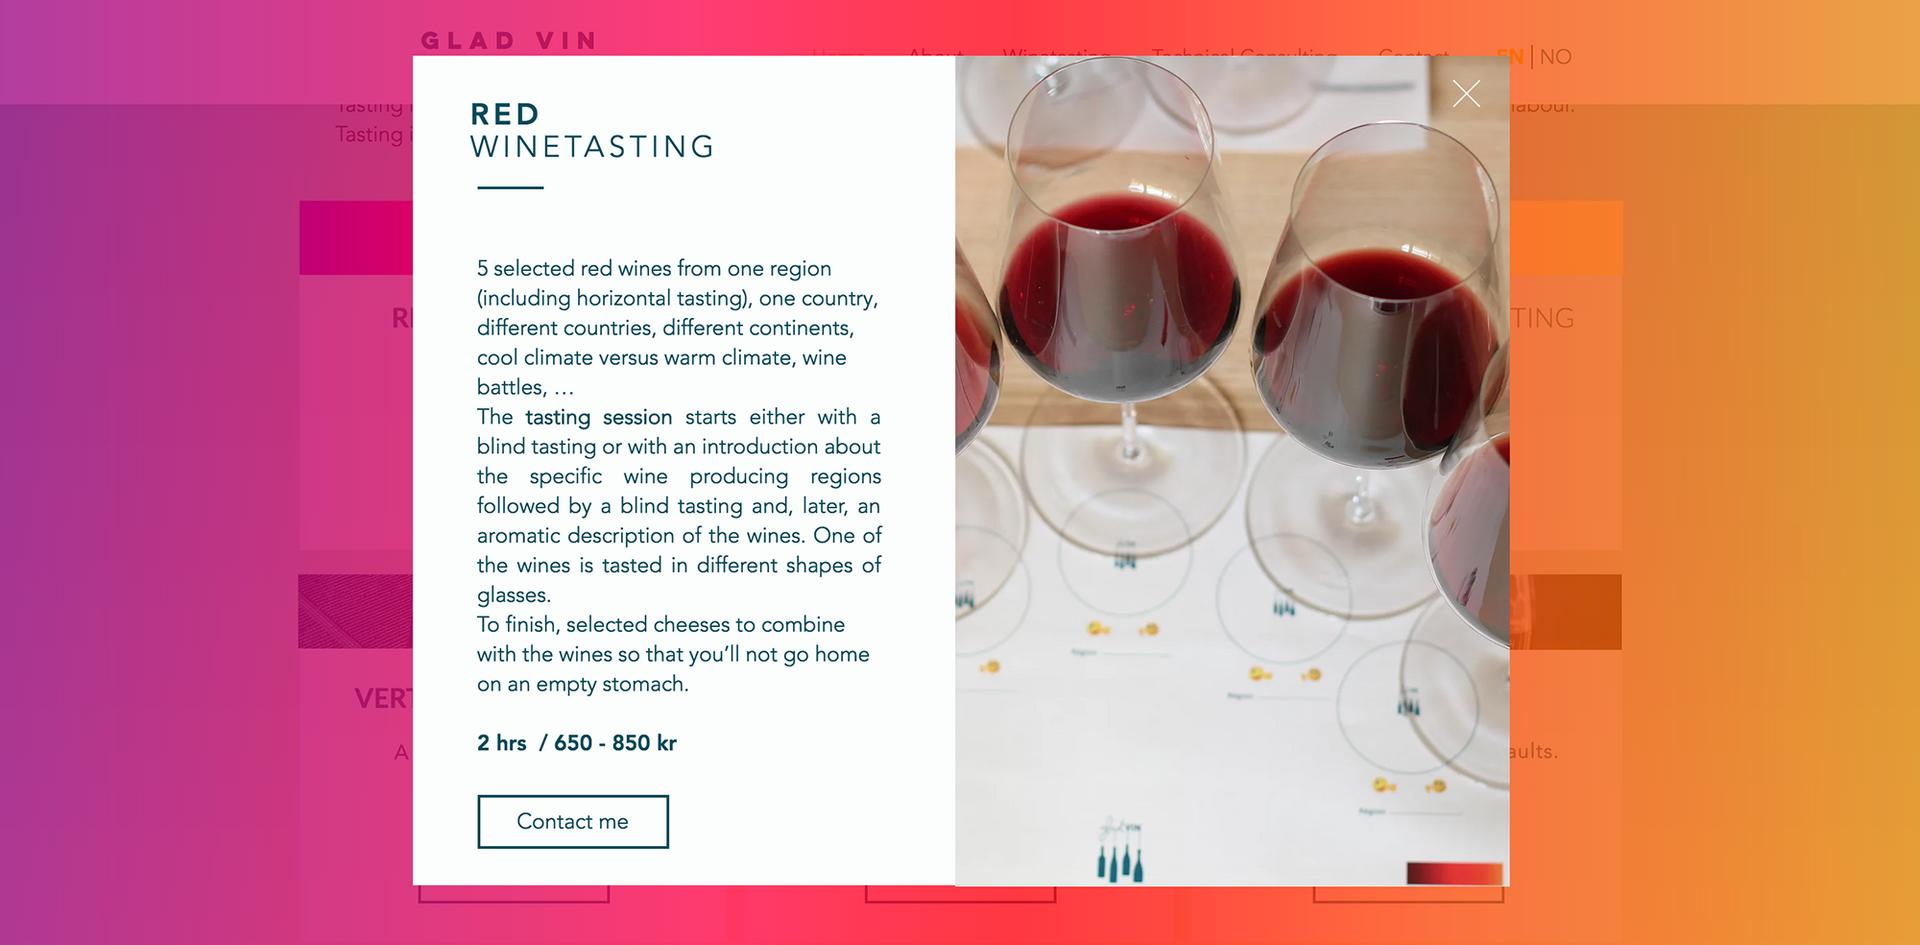 red winetasting